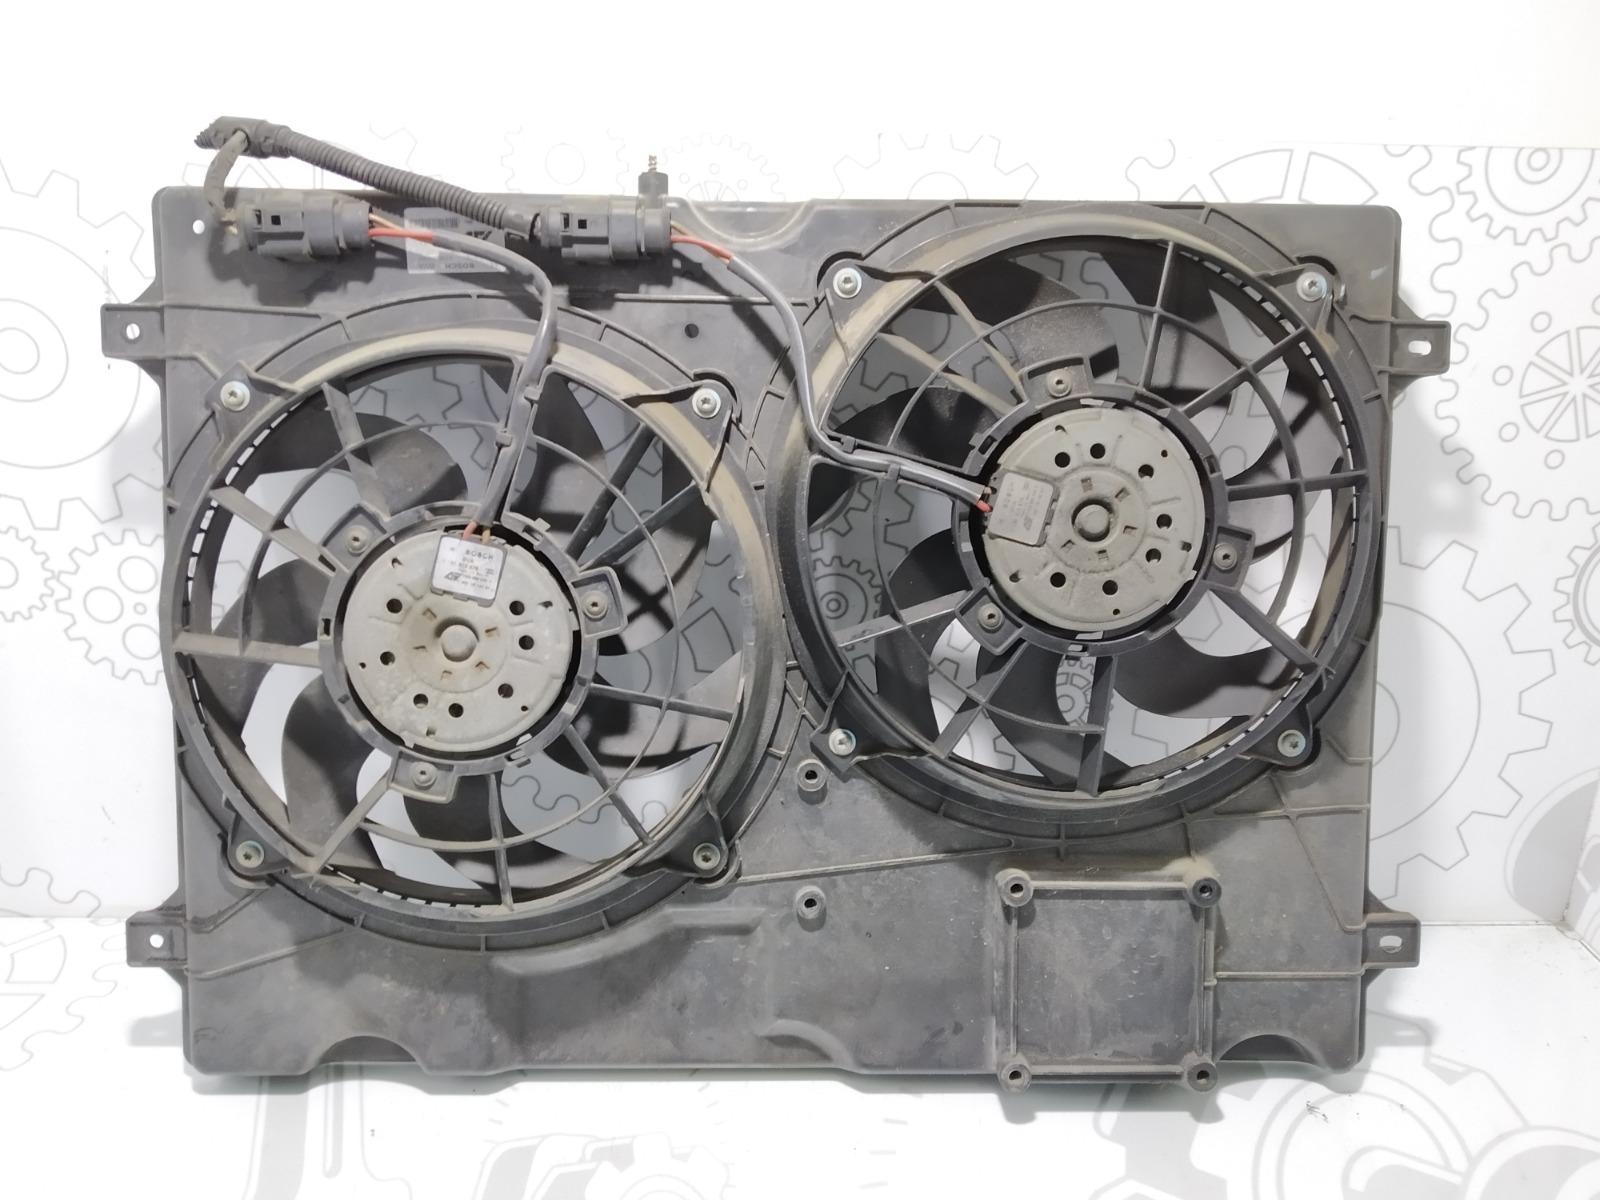 Вентилятор радиатора Ford Galaxy 2.3 I 2000 (б/у)